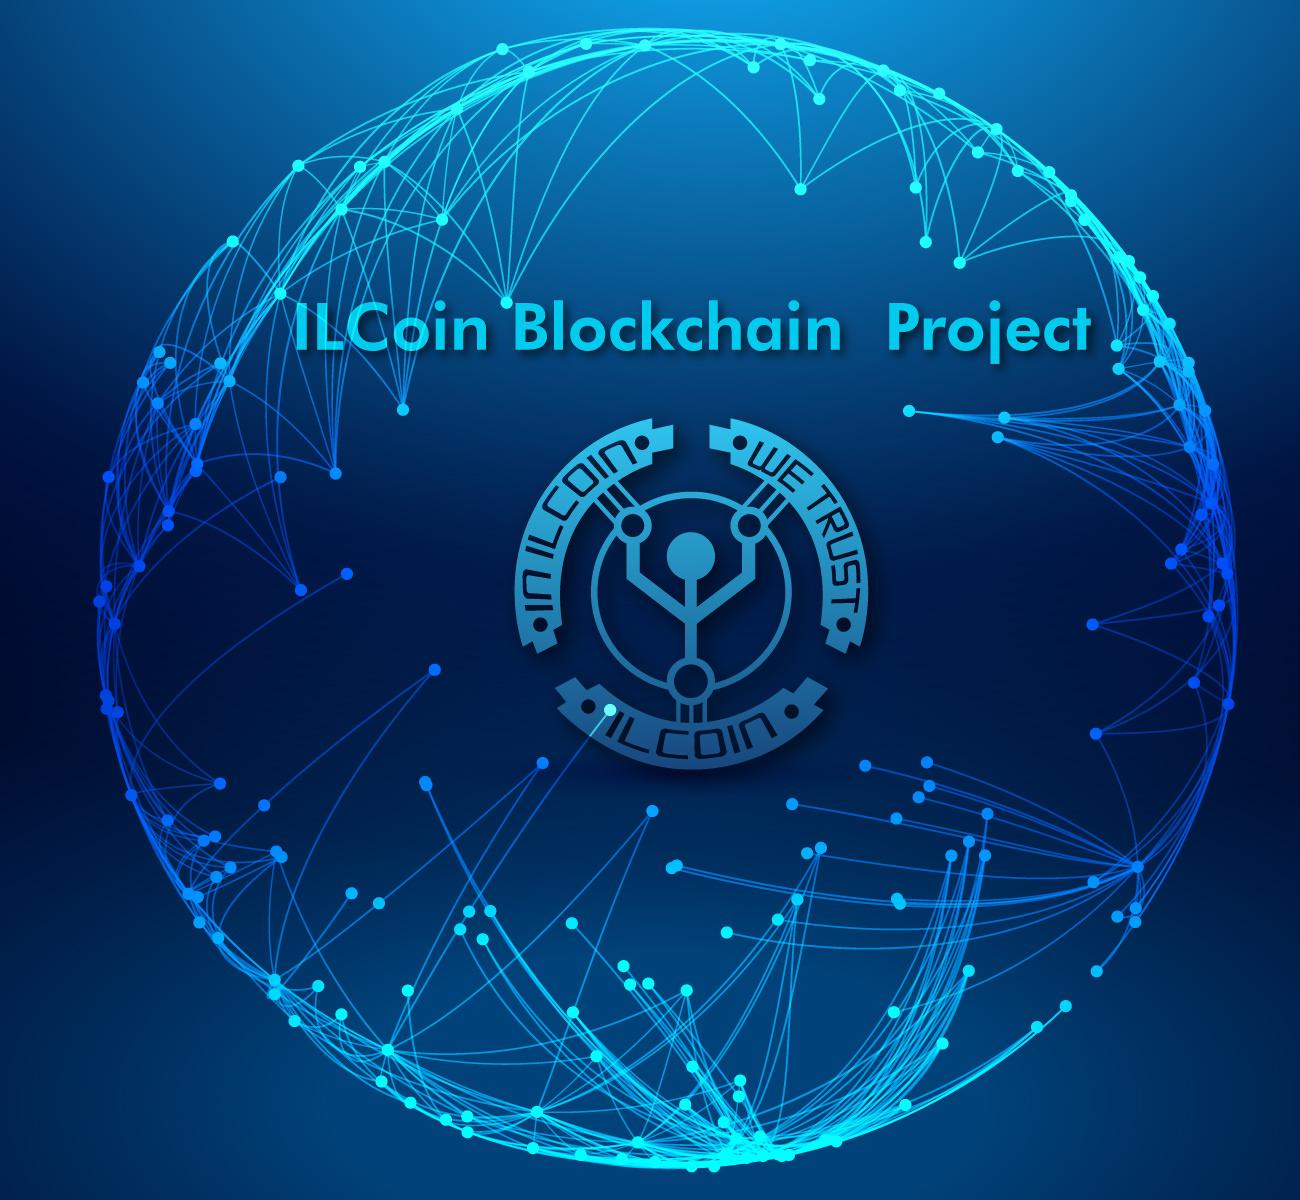 ILCoinブロックチェーンプロジェクト